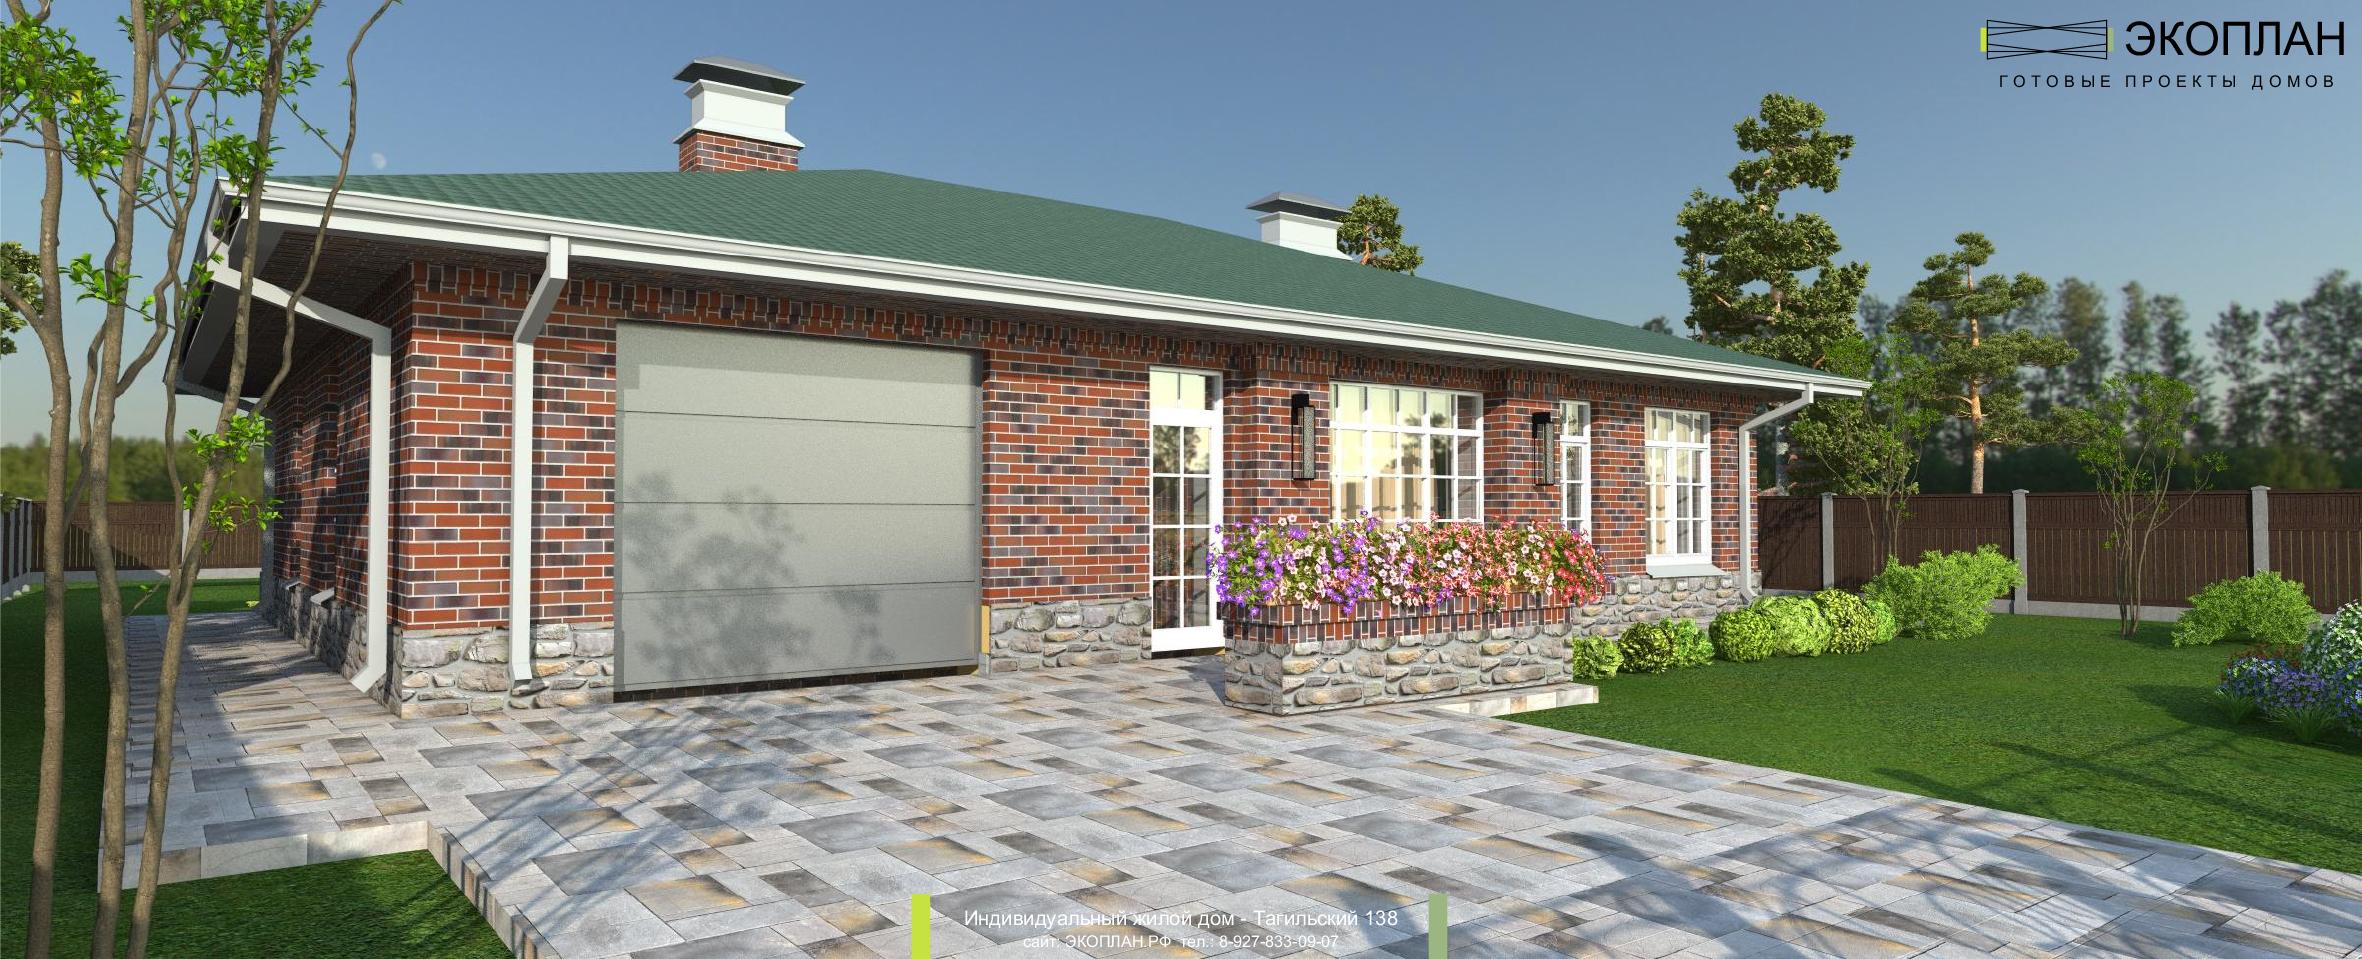 Тагильский 138 - Проект дома - Экоплан.рф фасад